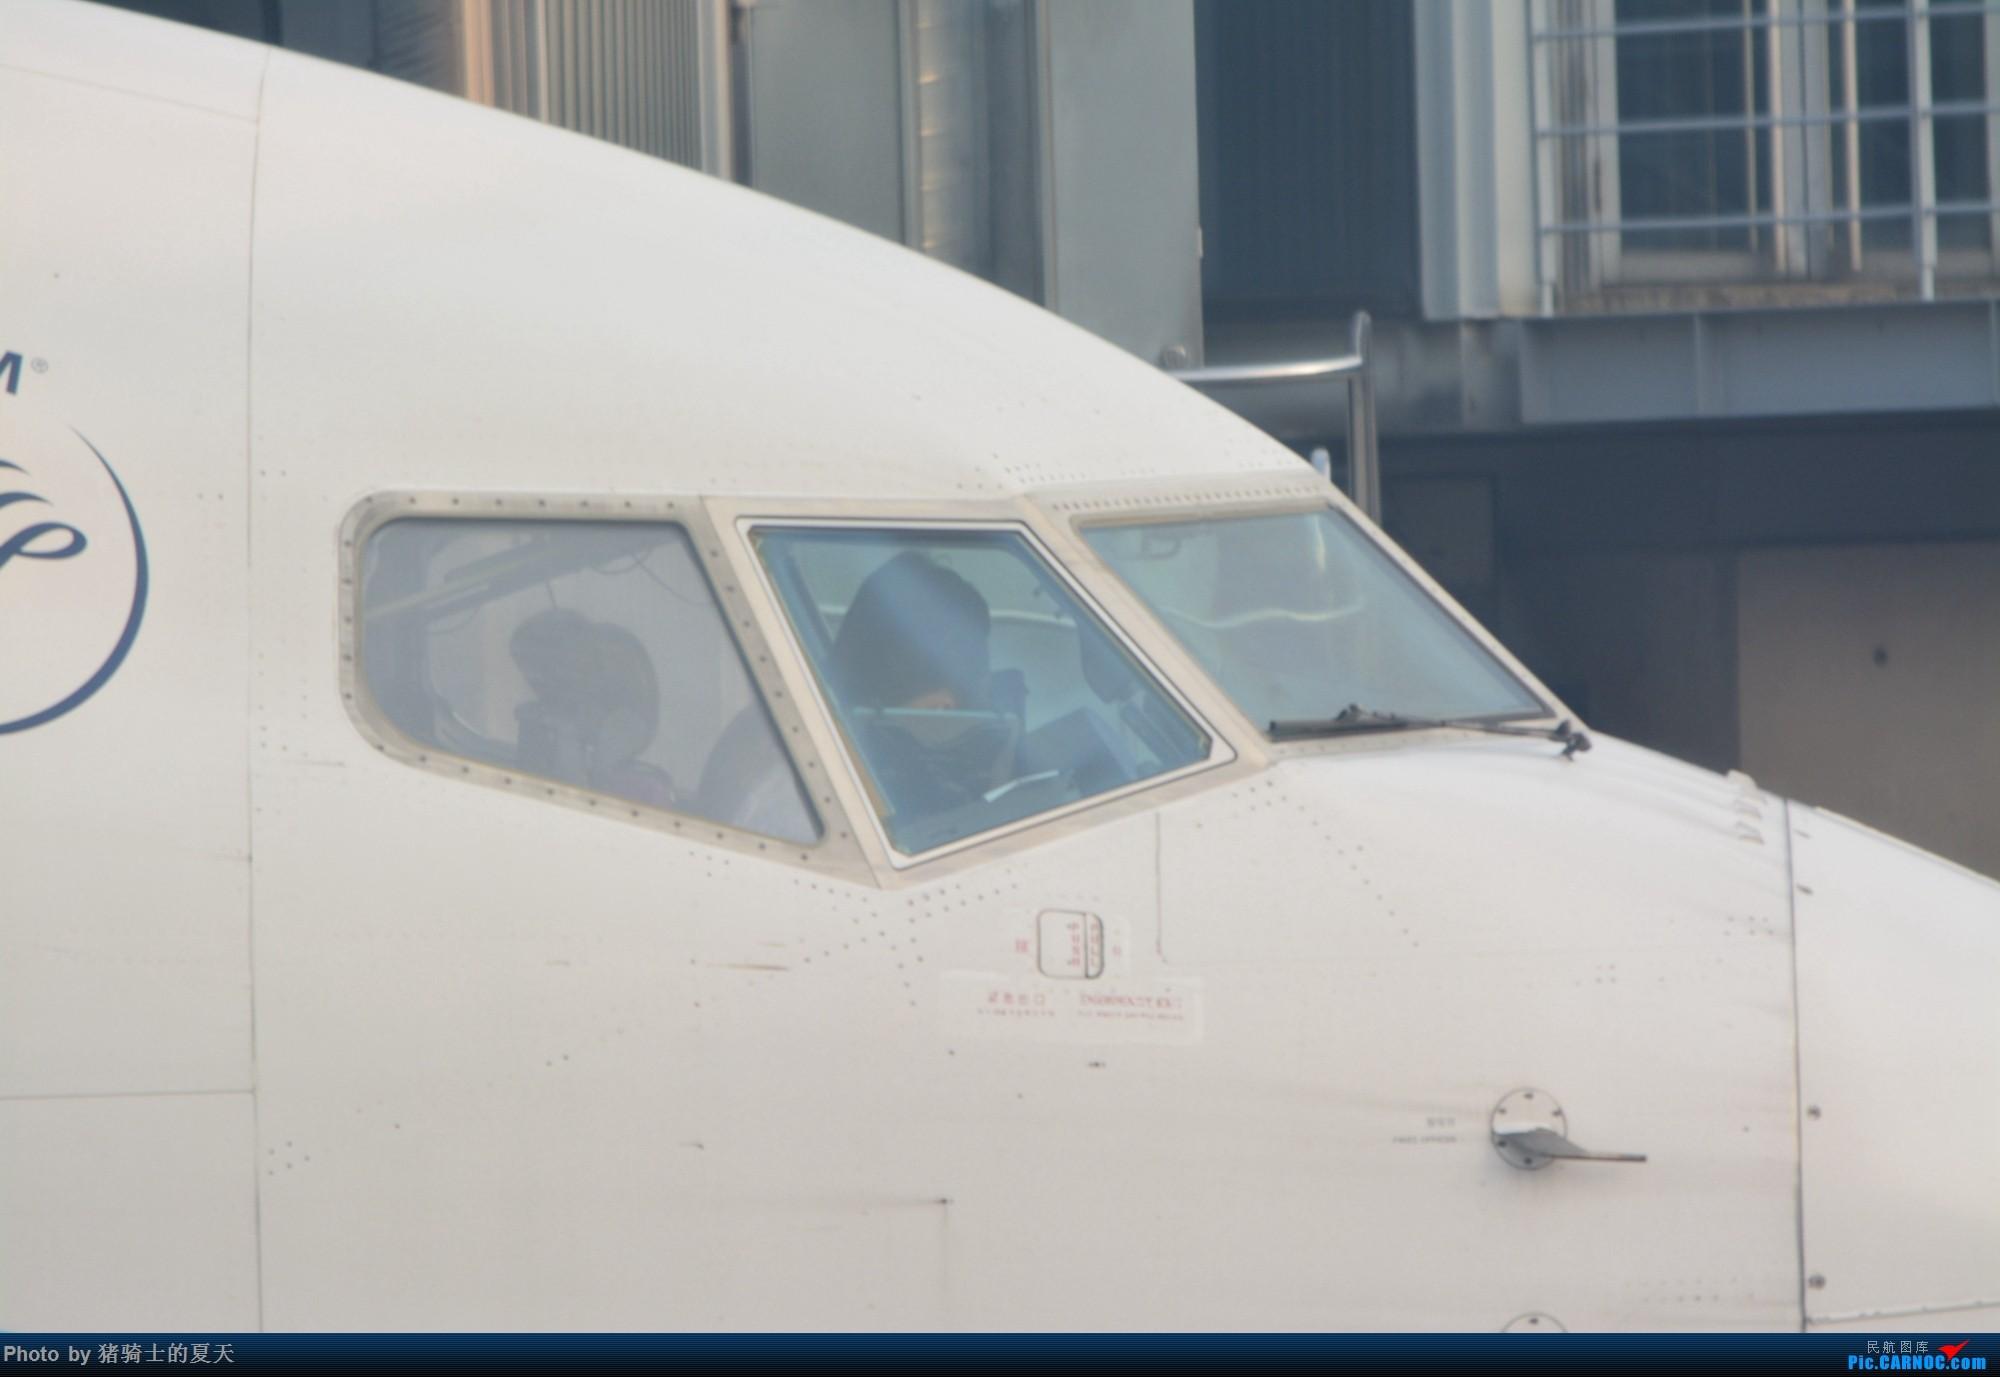 Re:[原创]2017年鸡鸭图 BOEING 737-800 B-7568 中国上海虹桥国际机场